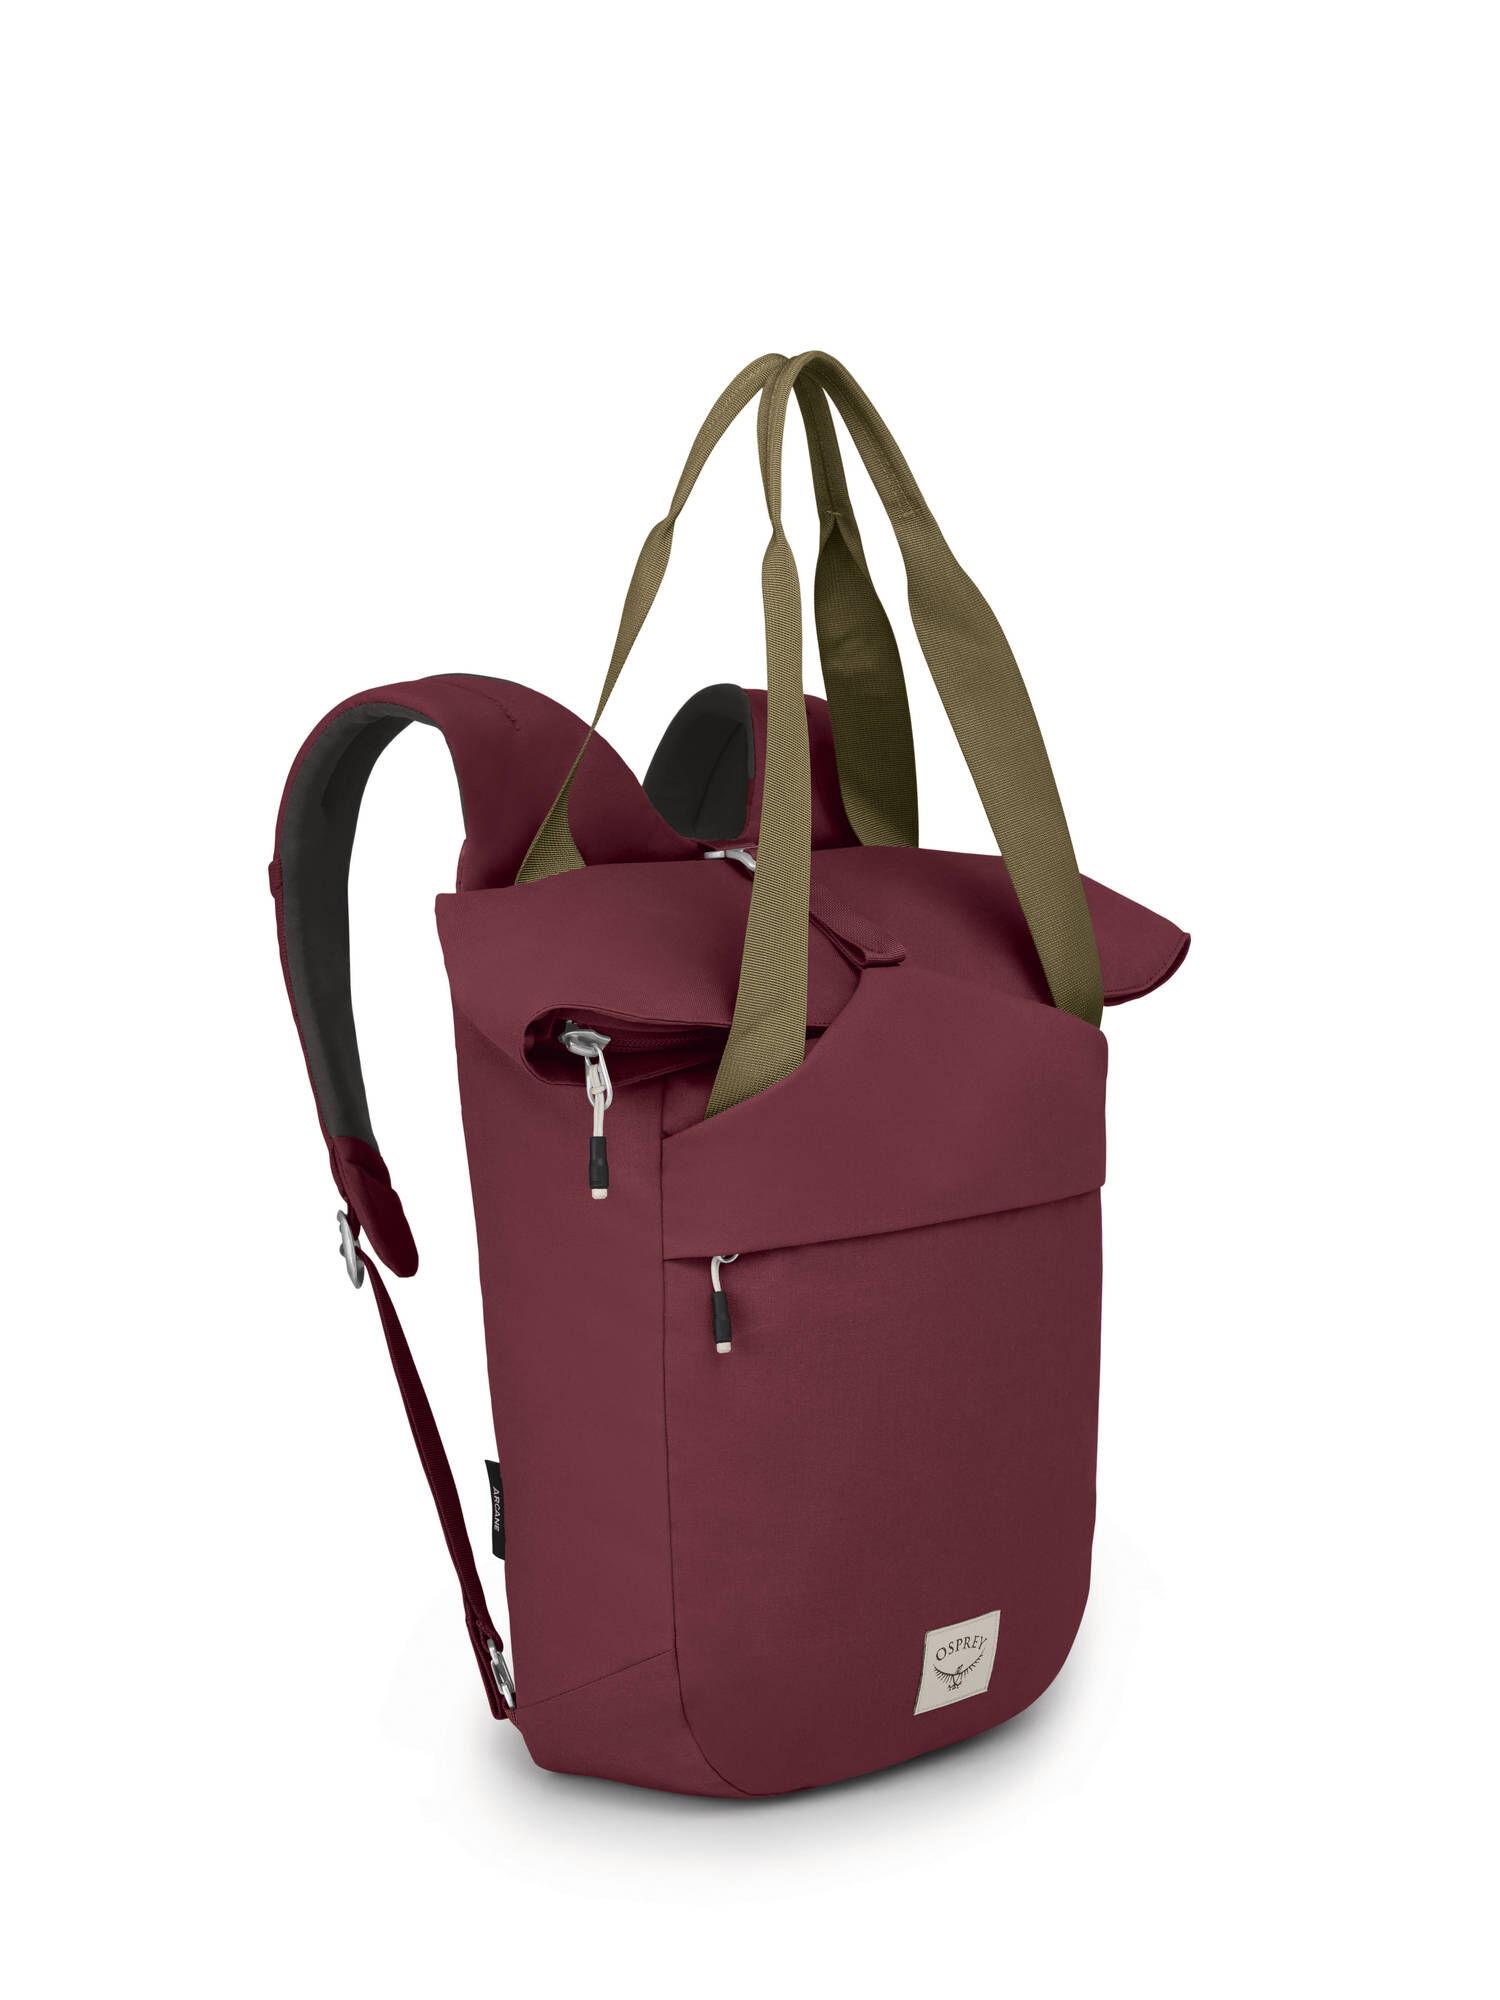 Osprey Arcane Tote Pack ryggsekk / håndveske Mud Red: 10002398 2020